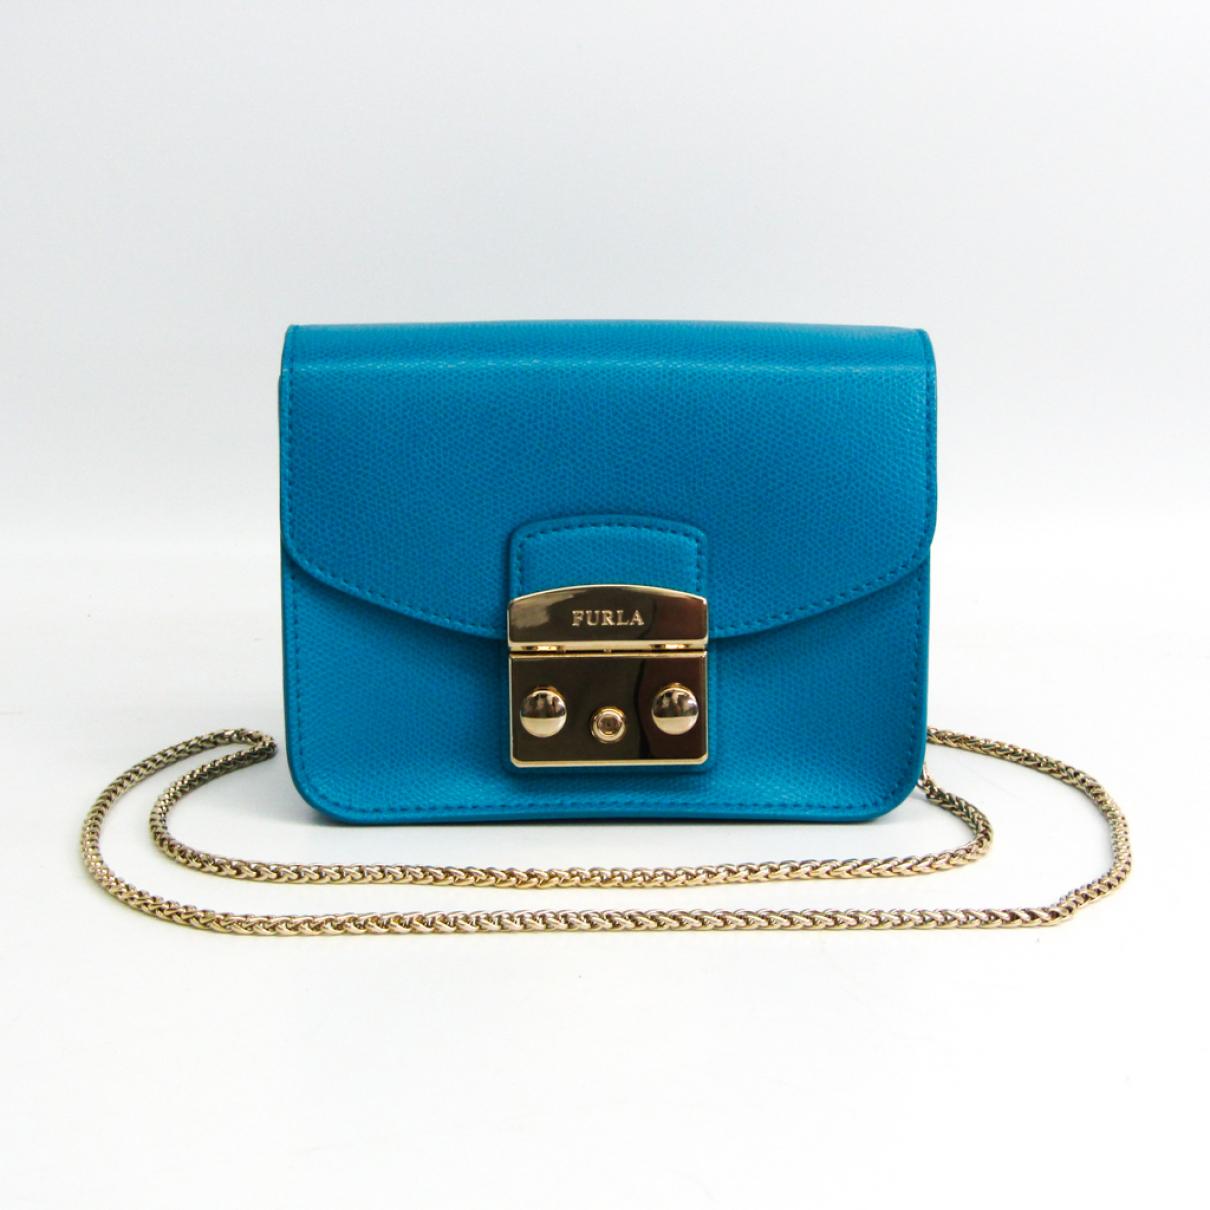 Furla - Sac a main Metropolis pour femme en cuir - bleu